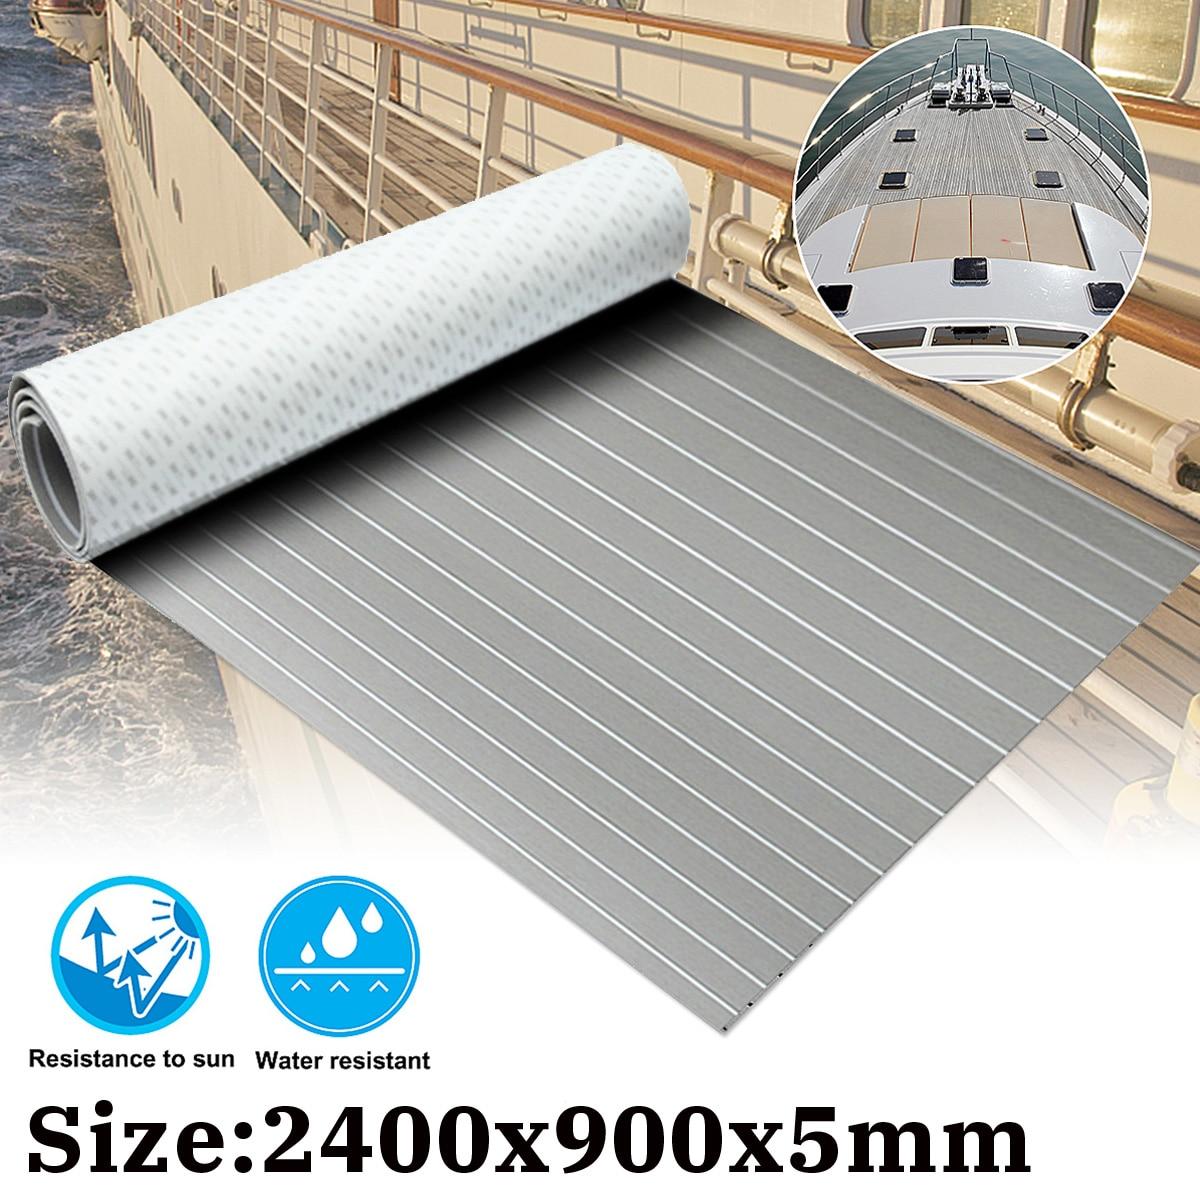 240cmx90cmx5mm Self-Adhesive Teak Decking EVA Foam Marine Flooring Faux Grey White Lines EVA Foam Boat Decking Sheet Accessories